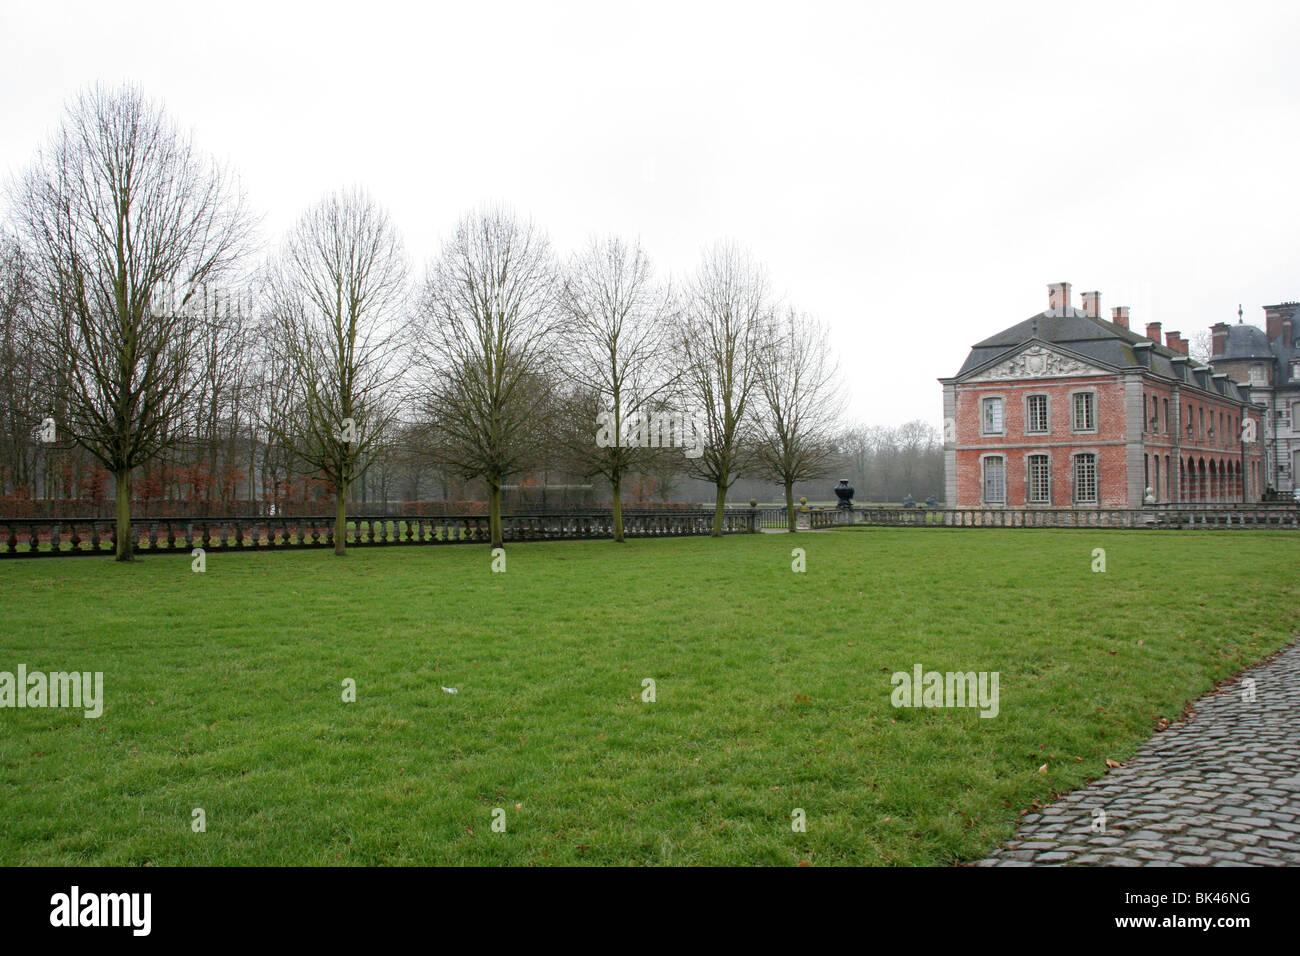 Beloeil palace in Belgium. - Stock Image